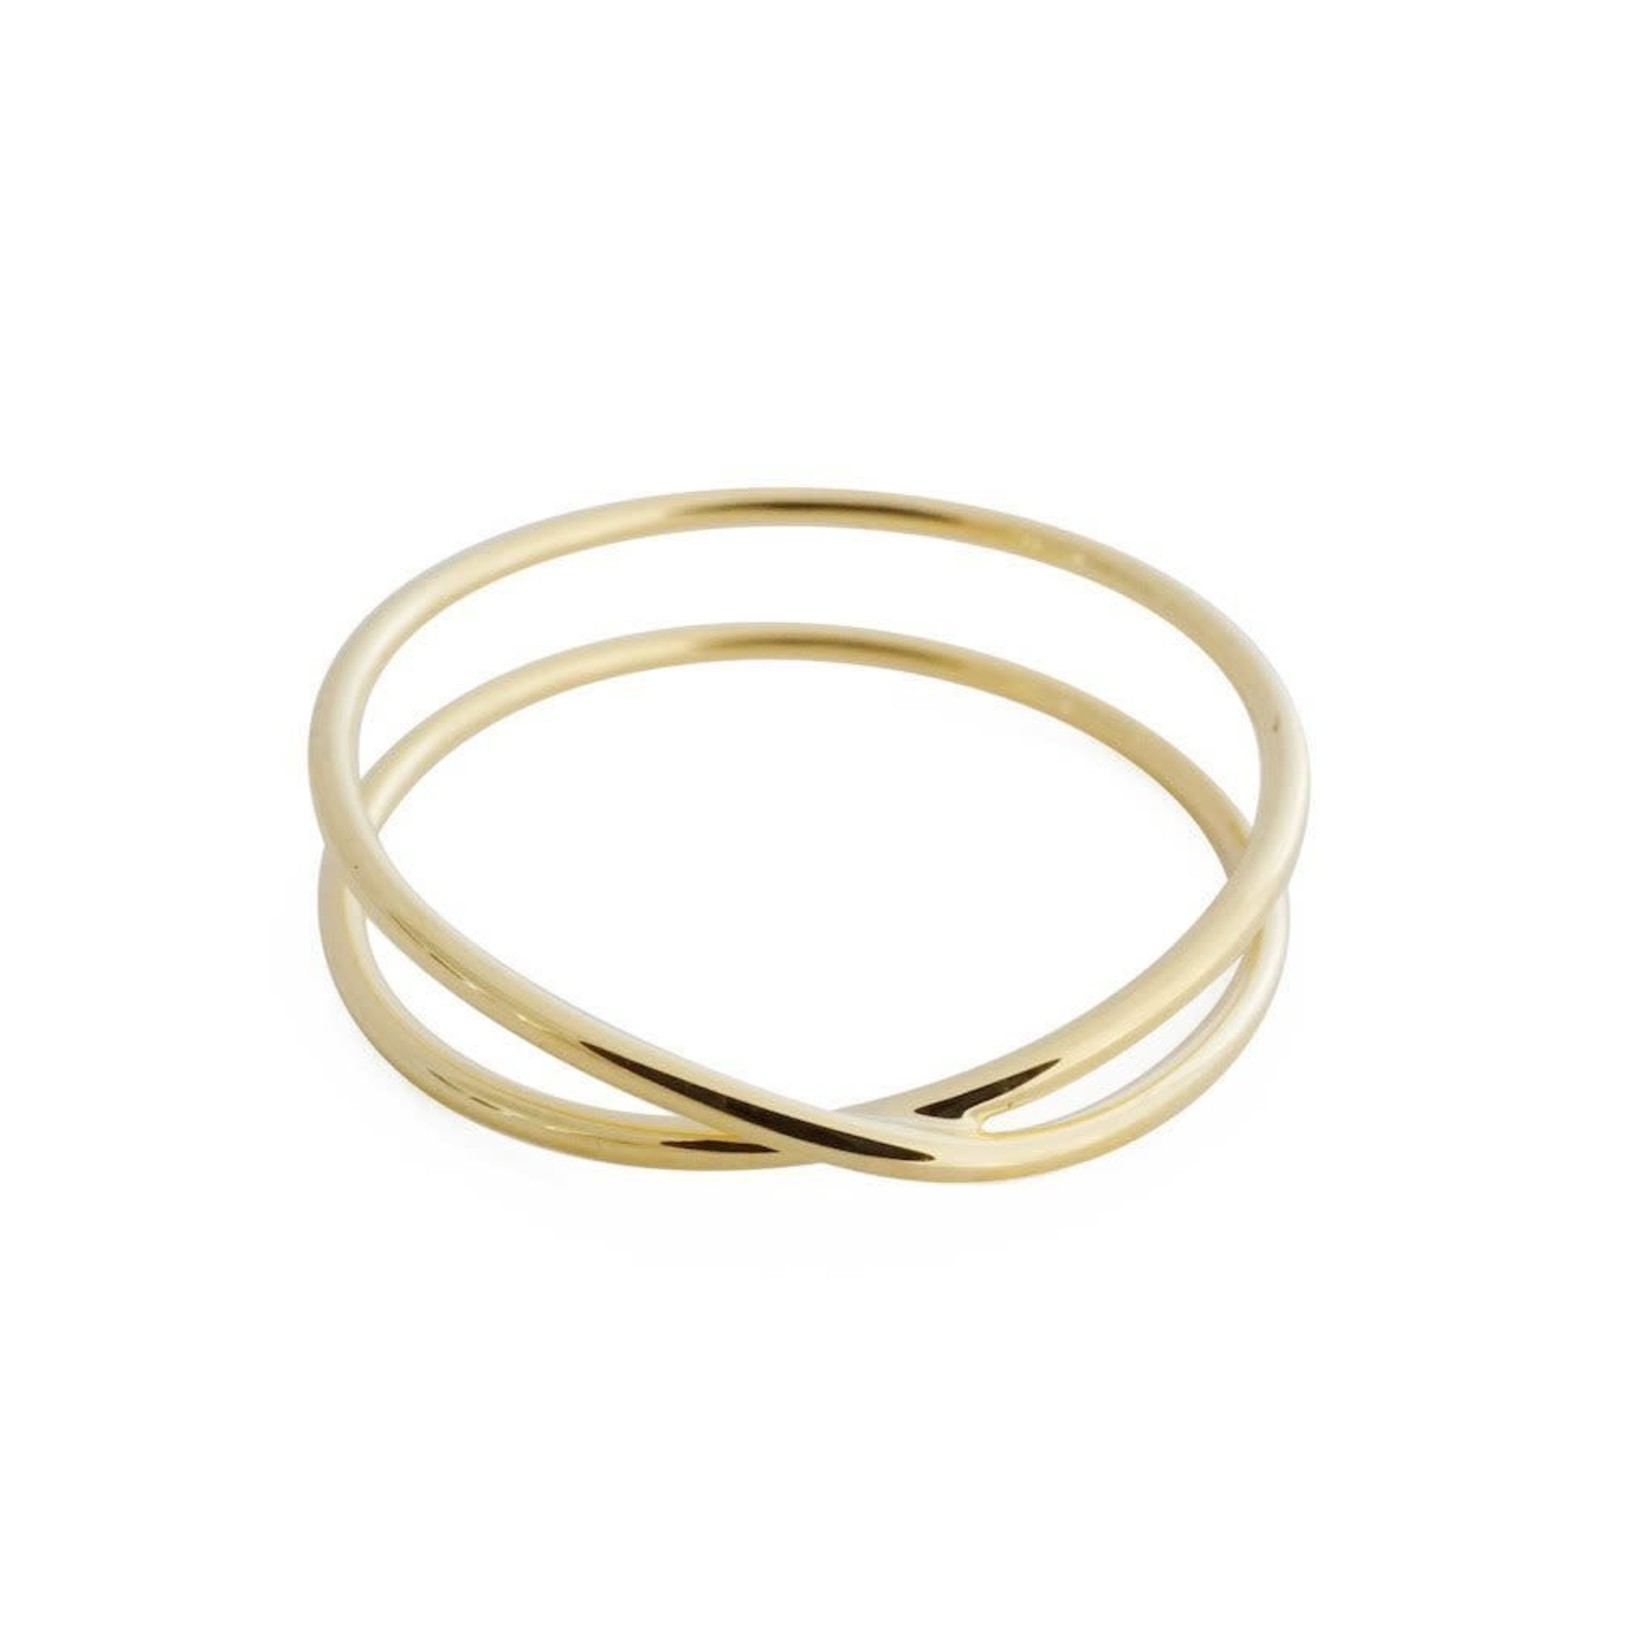 Honeycat Jewelry Honeycat Crossover X Ring Gold